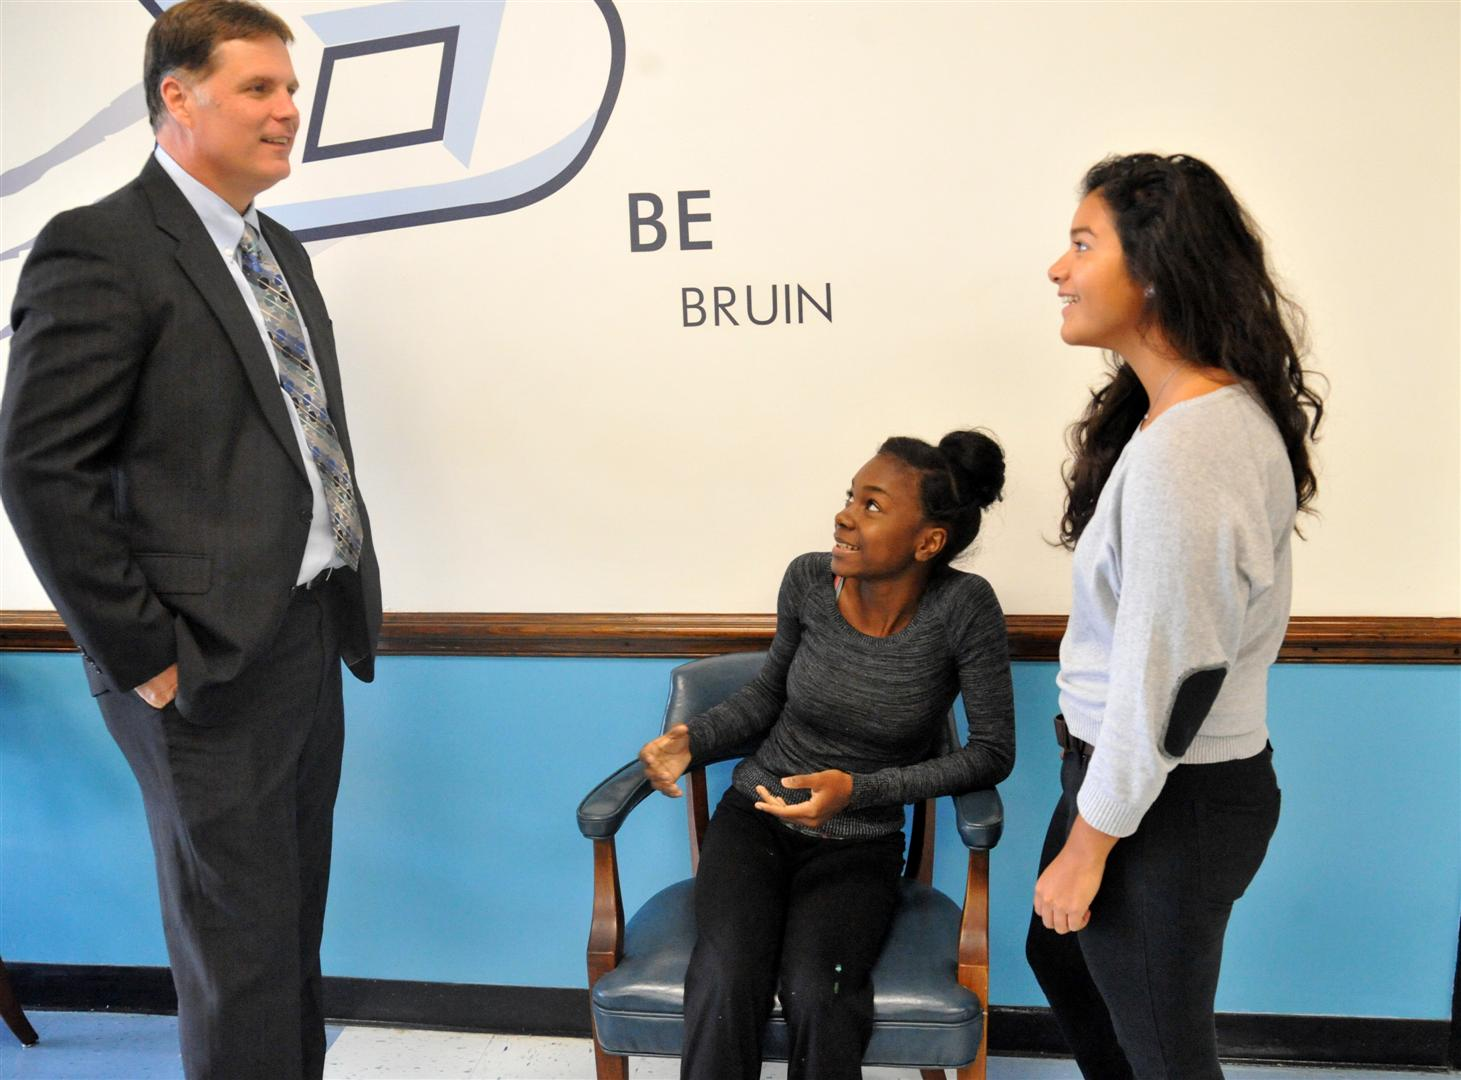 Mr. Franks talks with Martina and Elizabeth